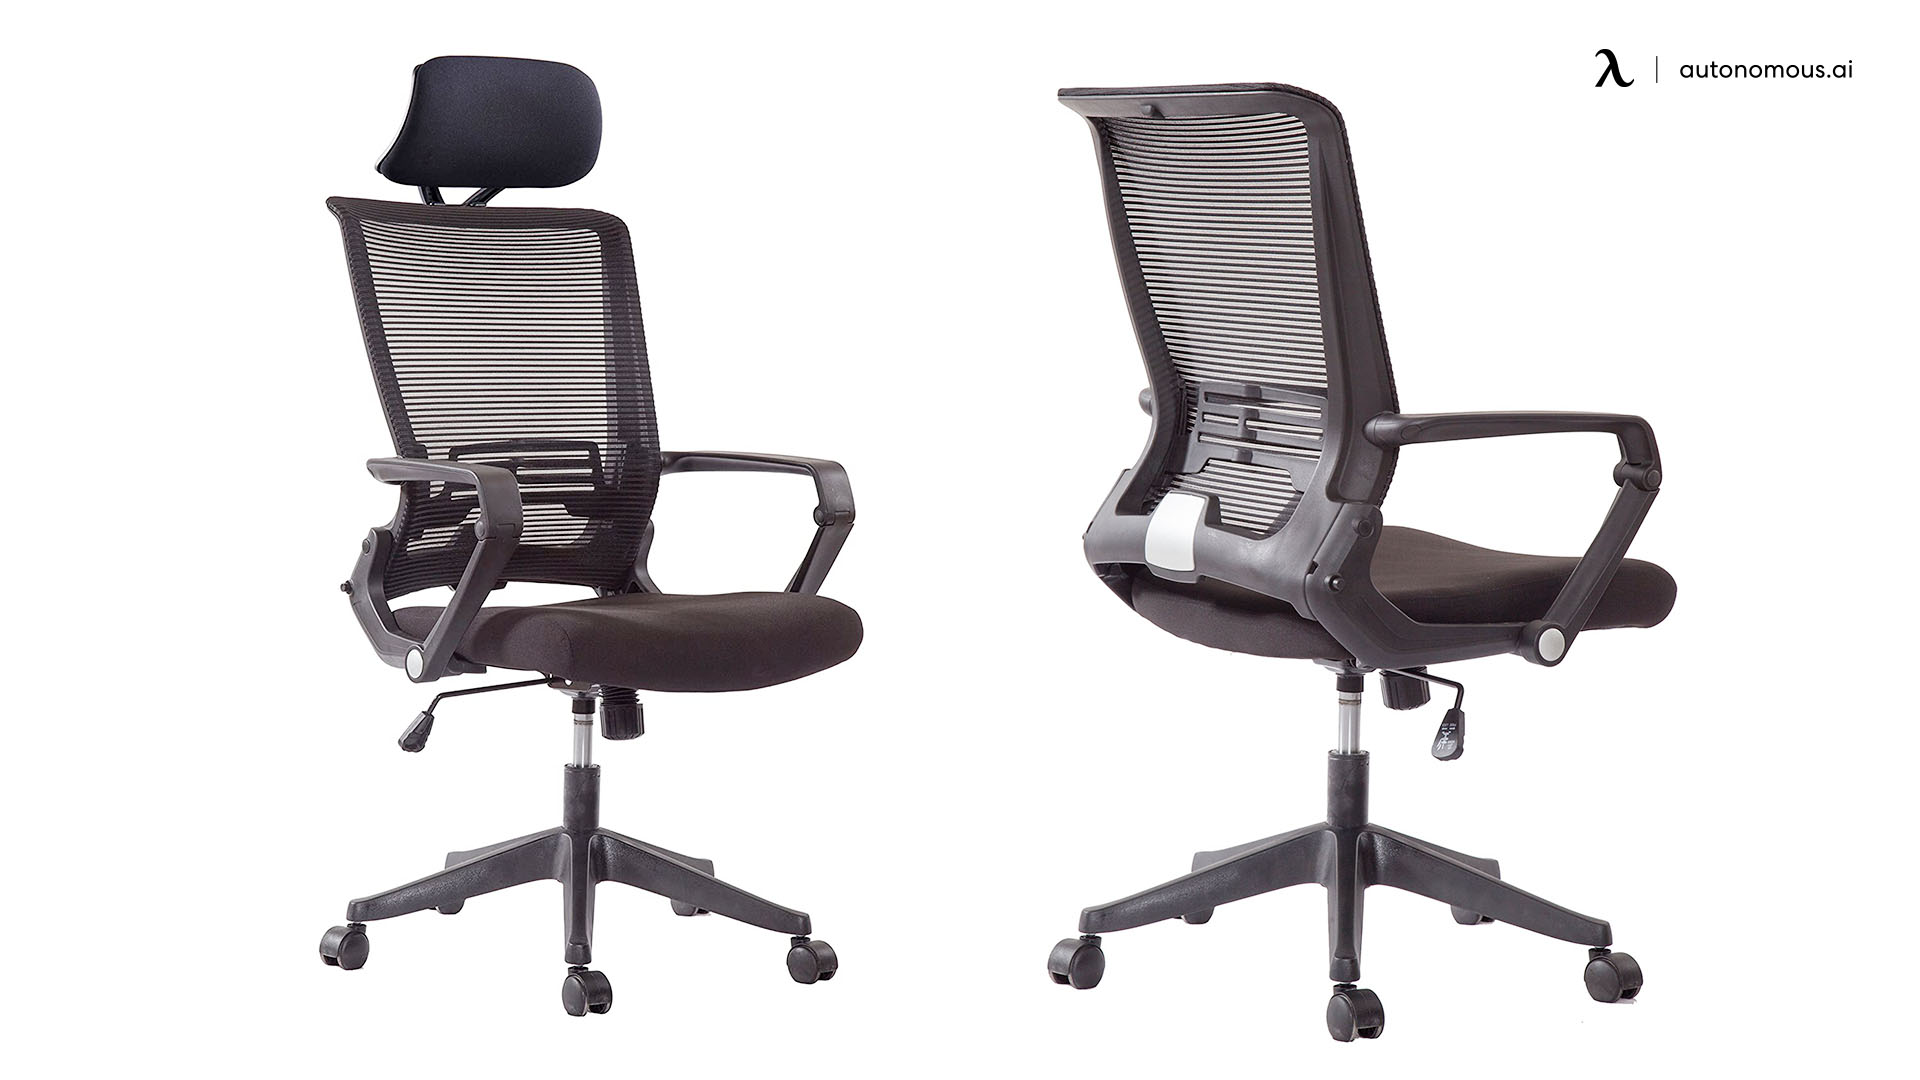 CJS Kiro Ergonomic Foldable Office Chair